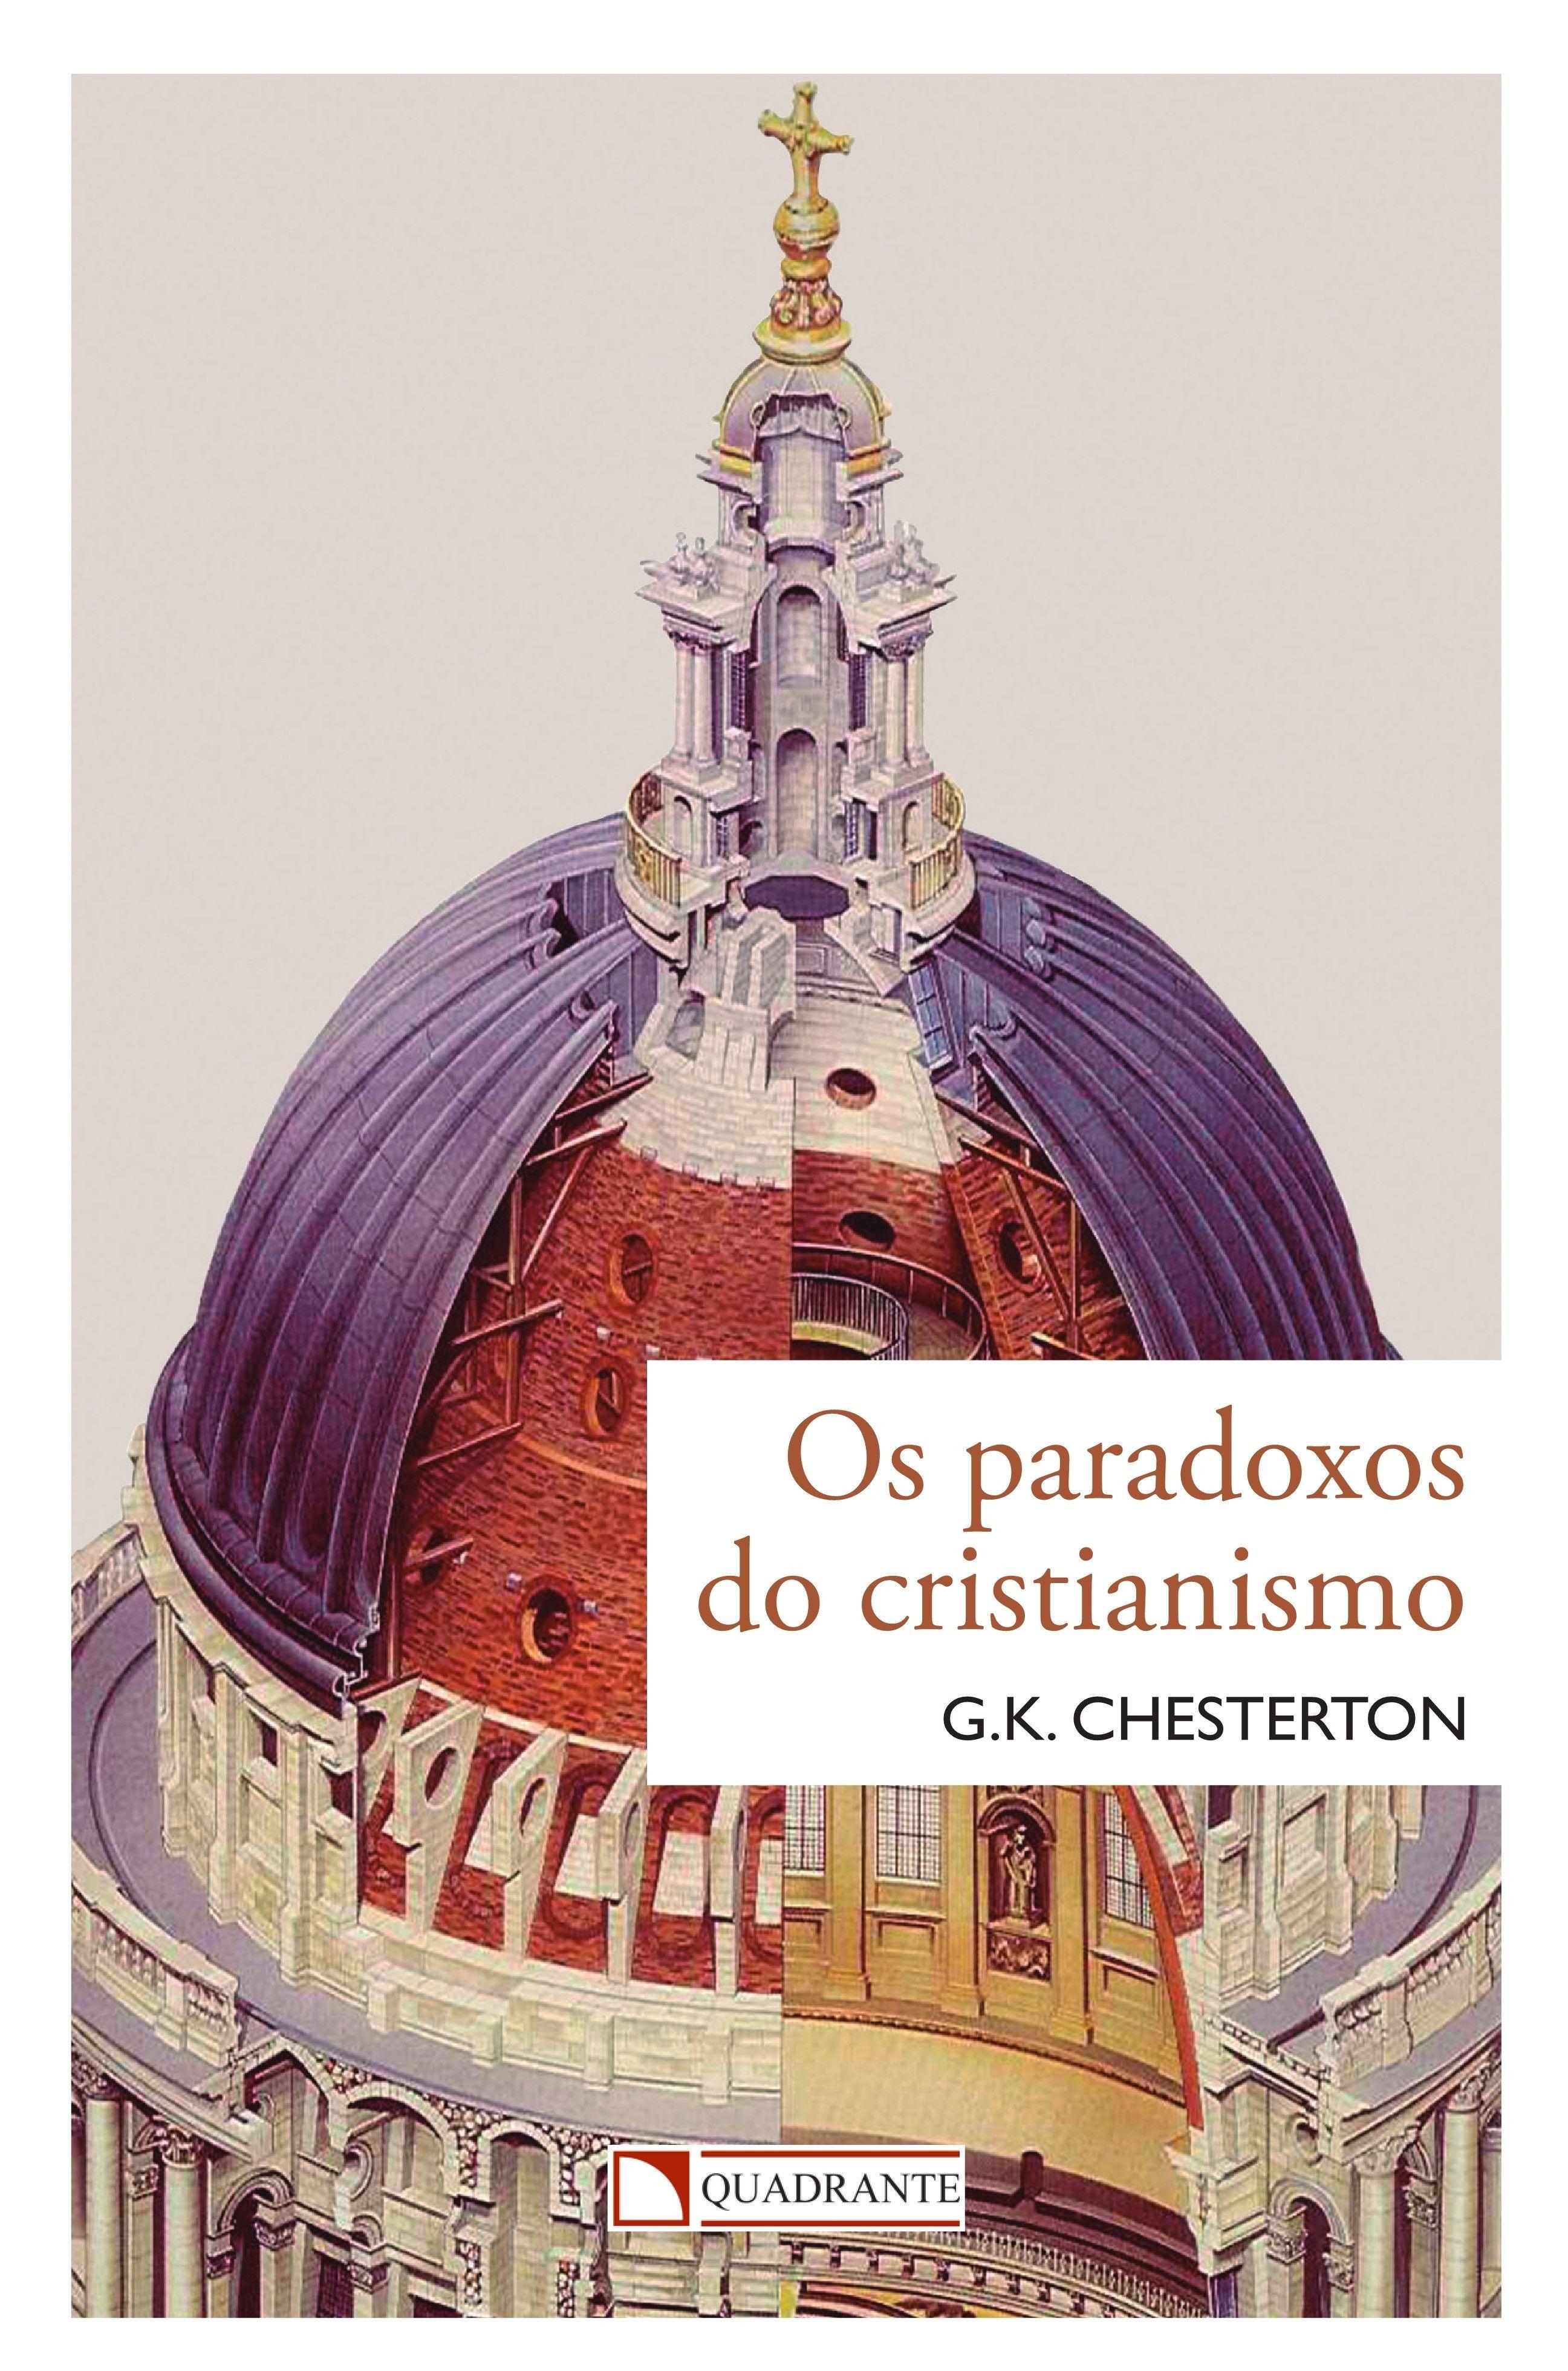 Livro Os Paradoxos do cristianismo